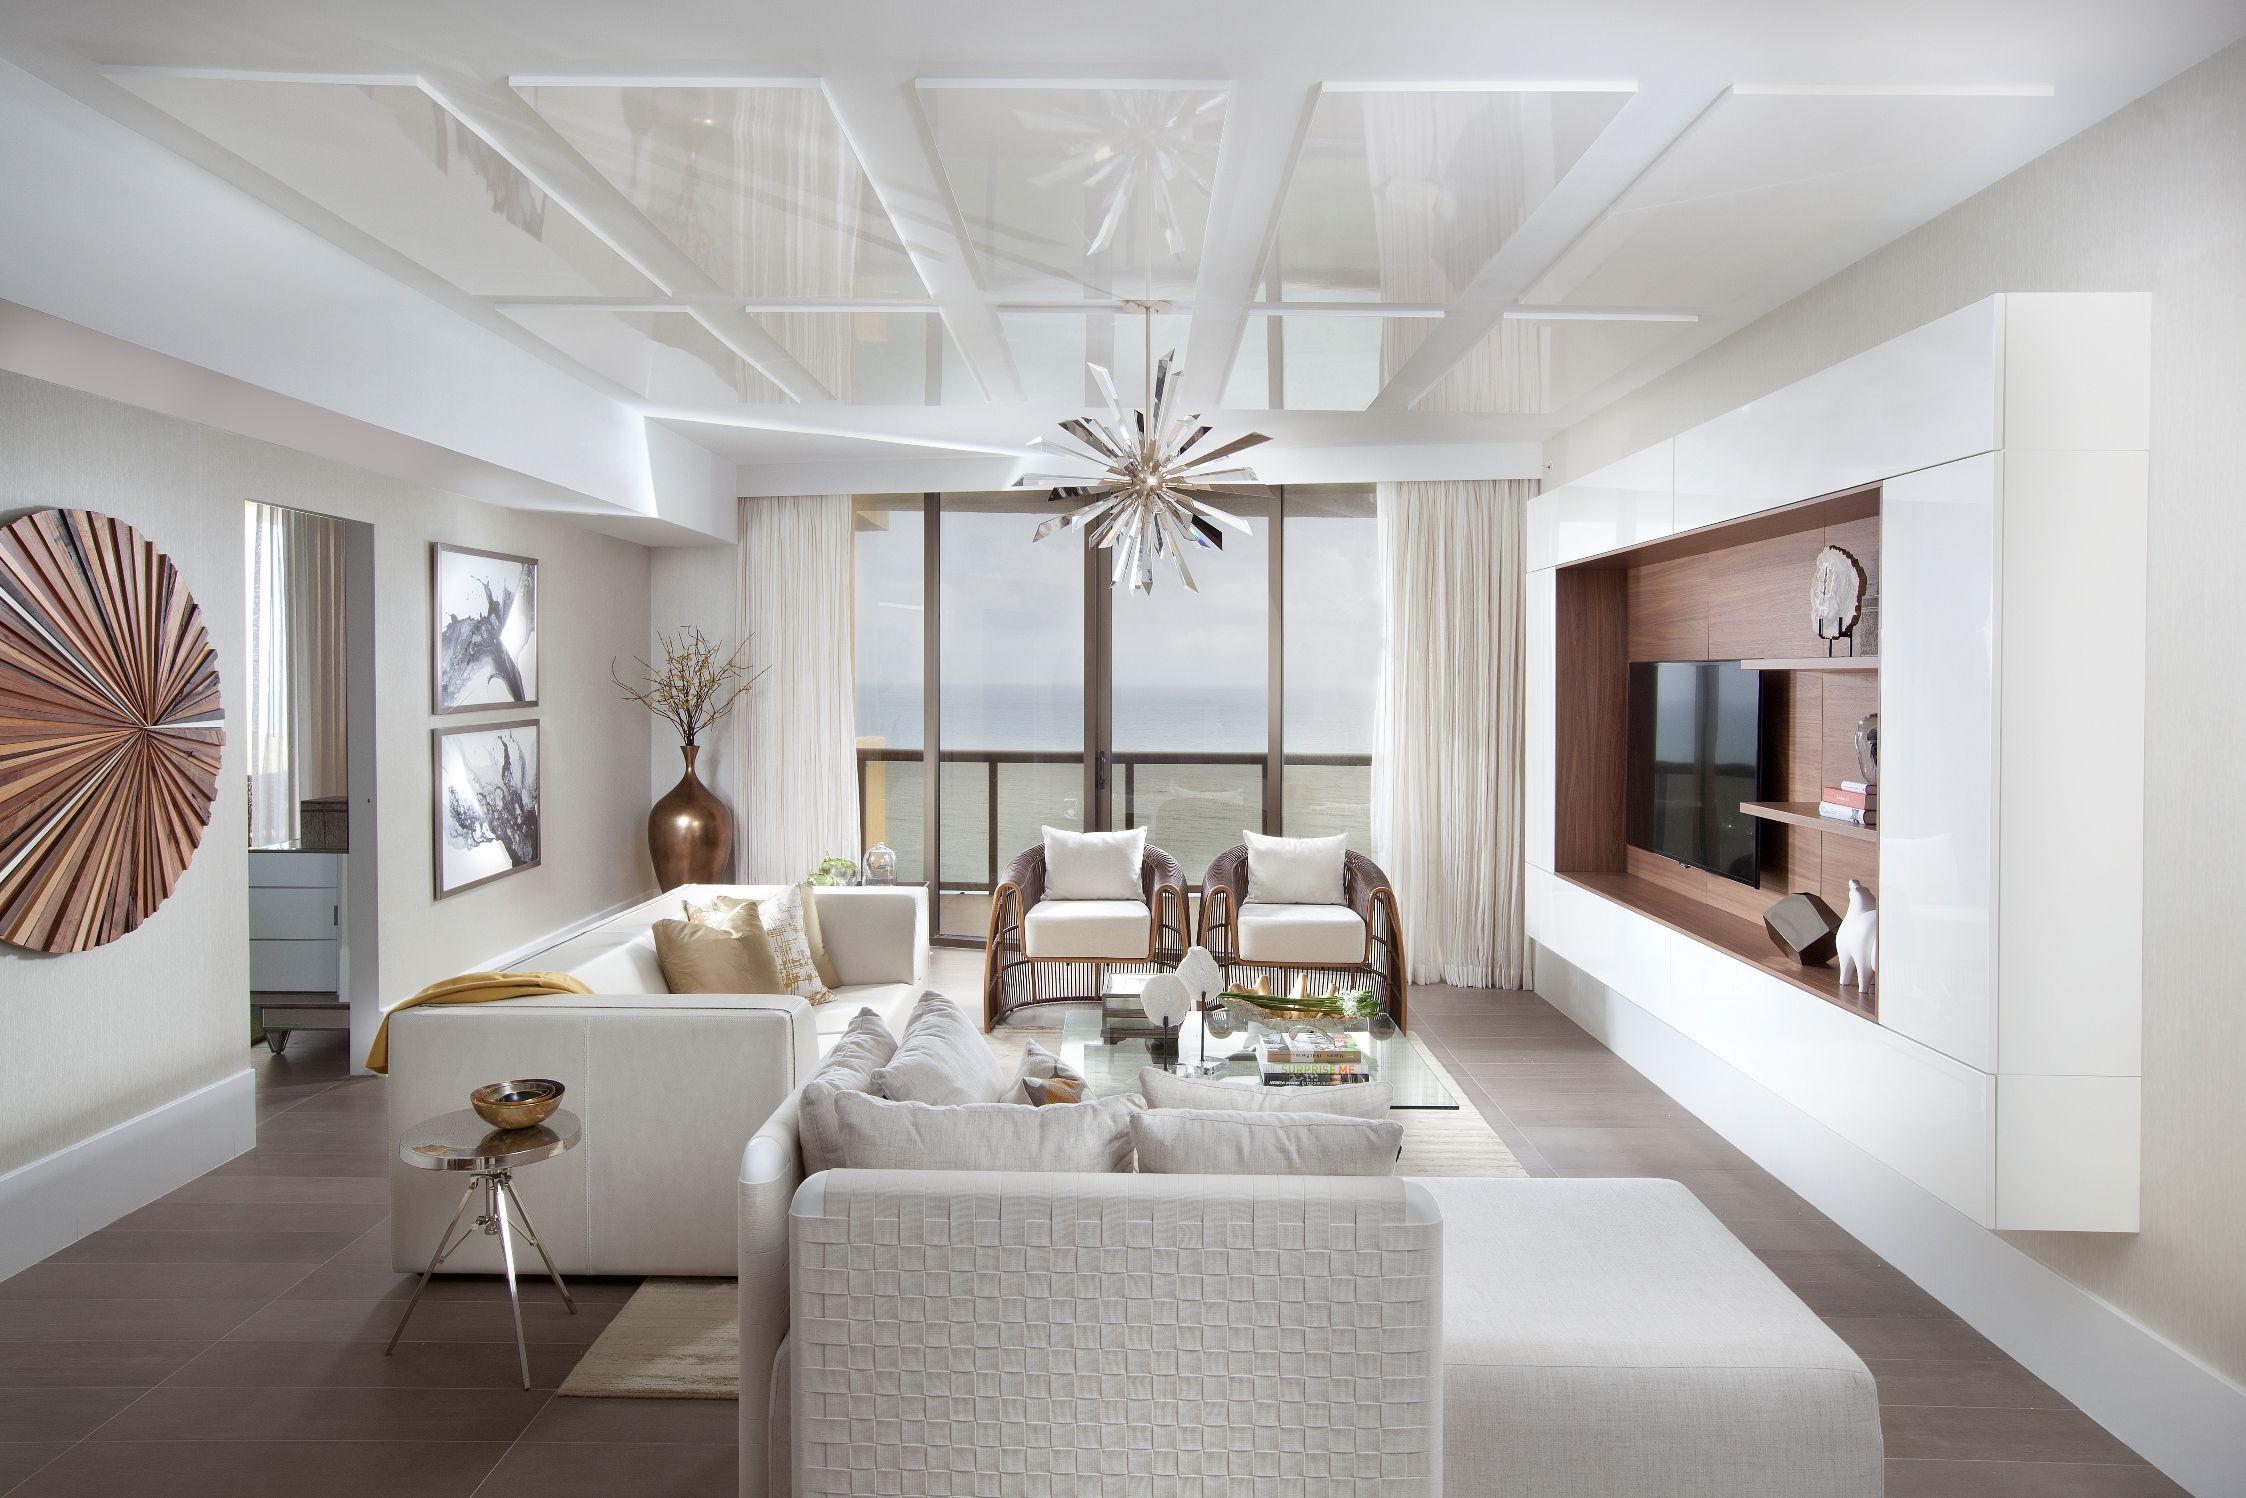 DKOR LIVING BLOG - RESIDENTIAL INTERIOR DESIGN | Miami, Living rooms ...